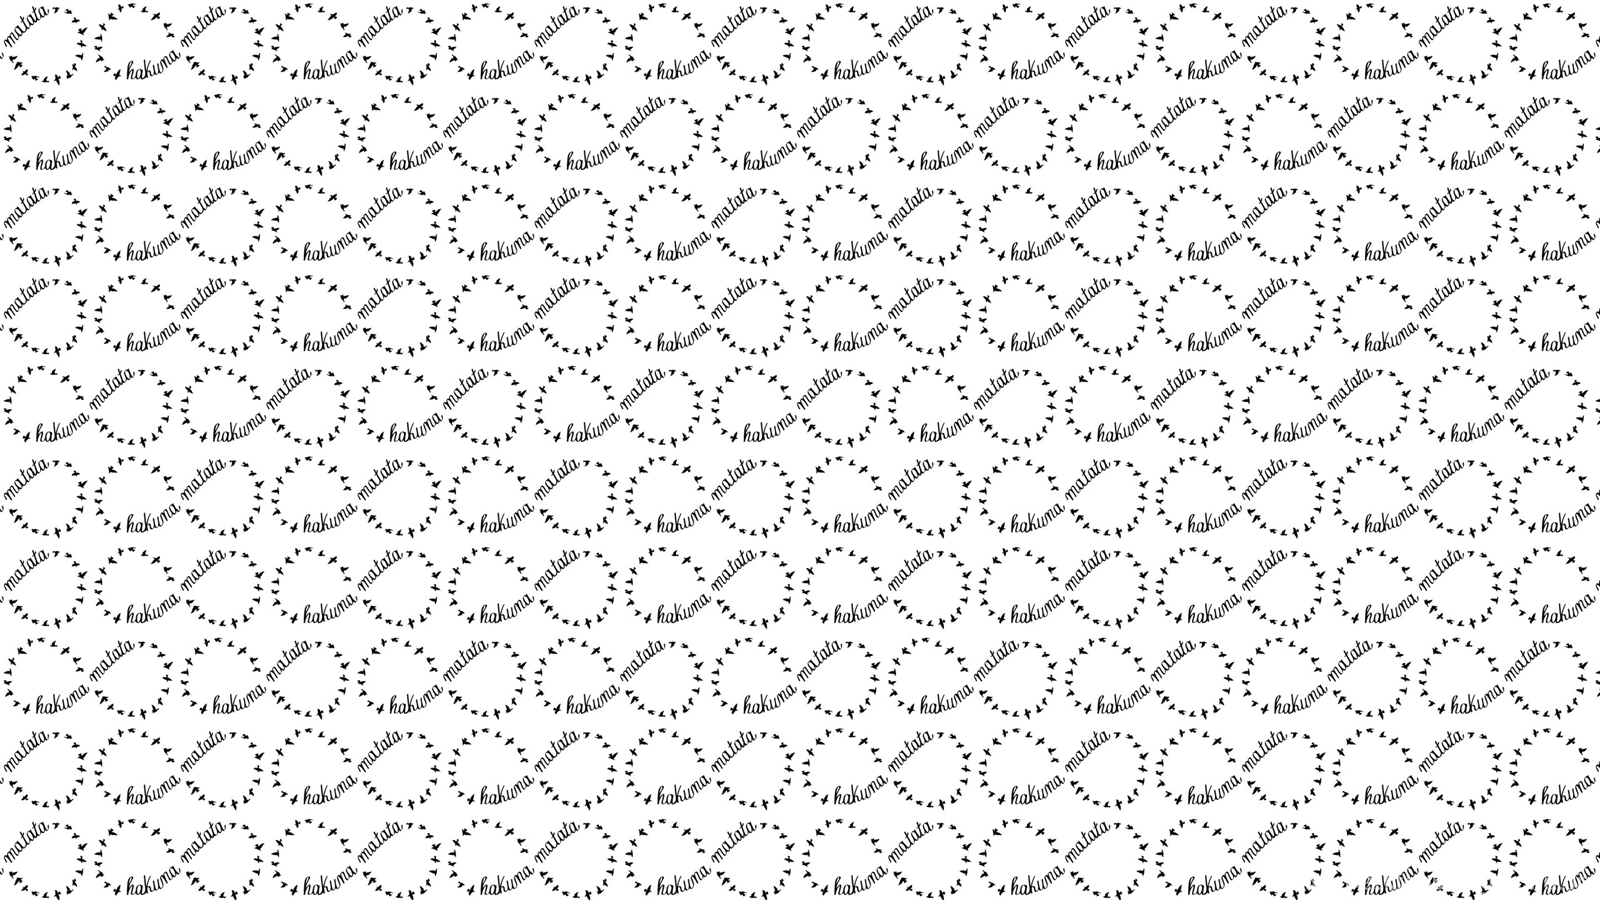 Hakuna Matata Desktop Wallpapers Desktop Background